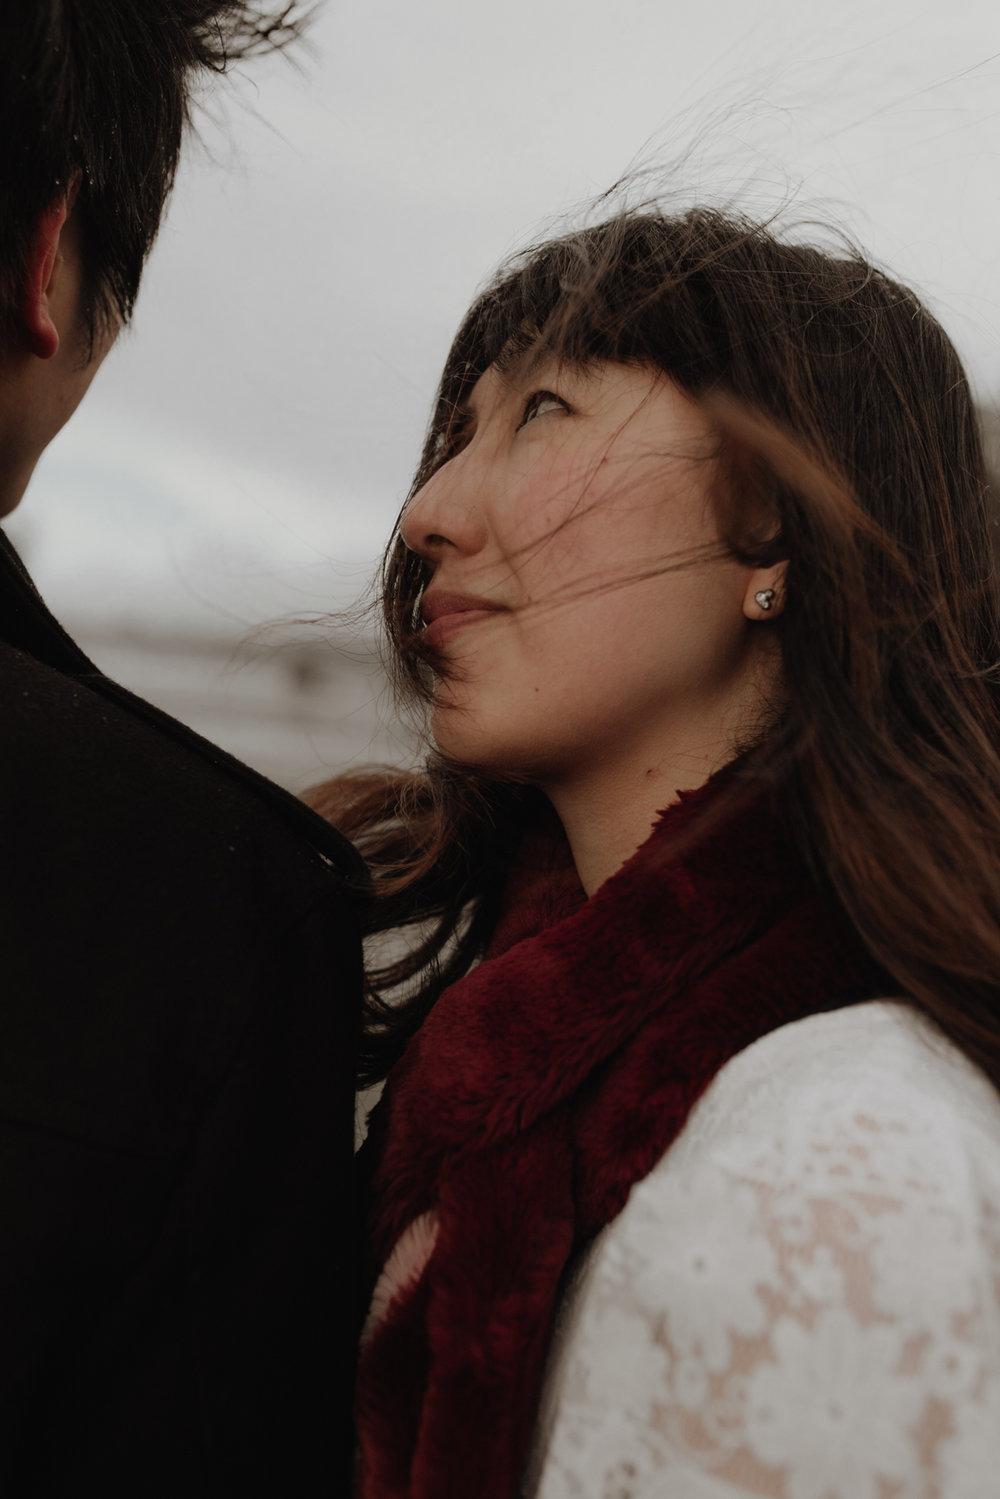 seattle-wedding-photographer-kerouac-0185.jpg